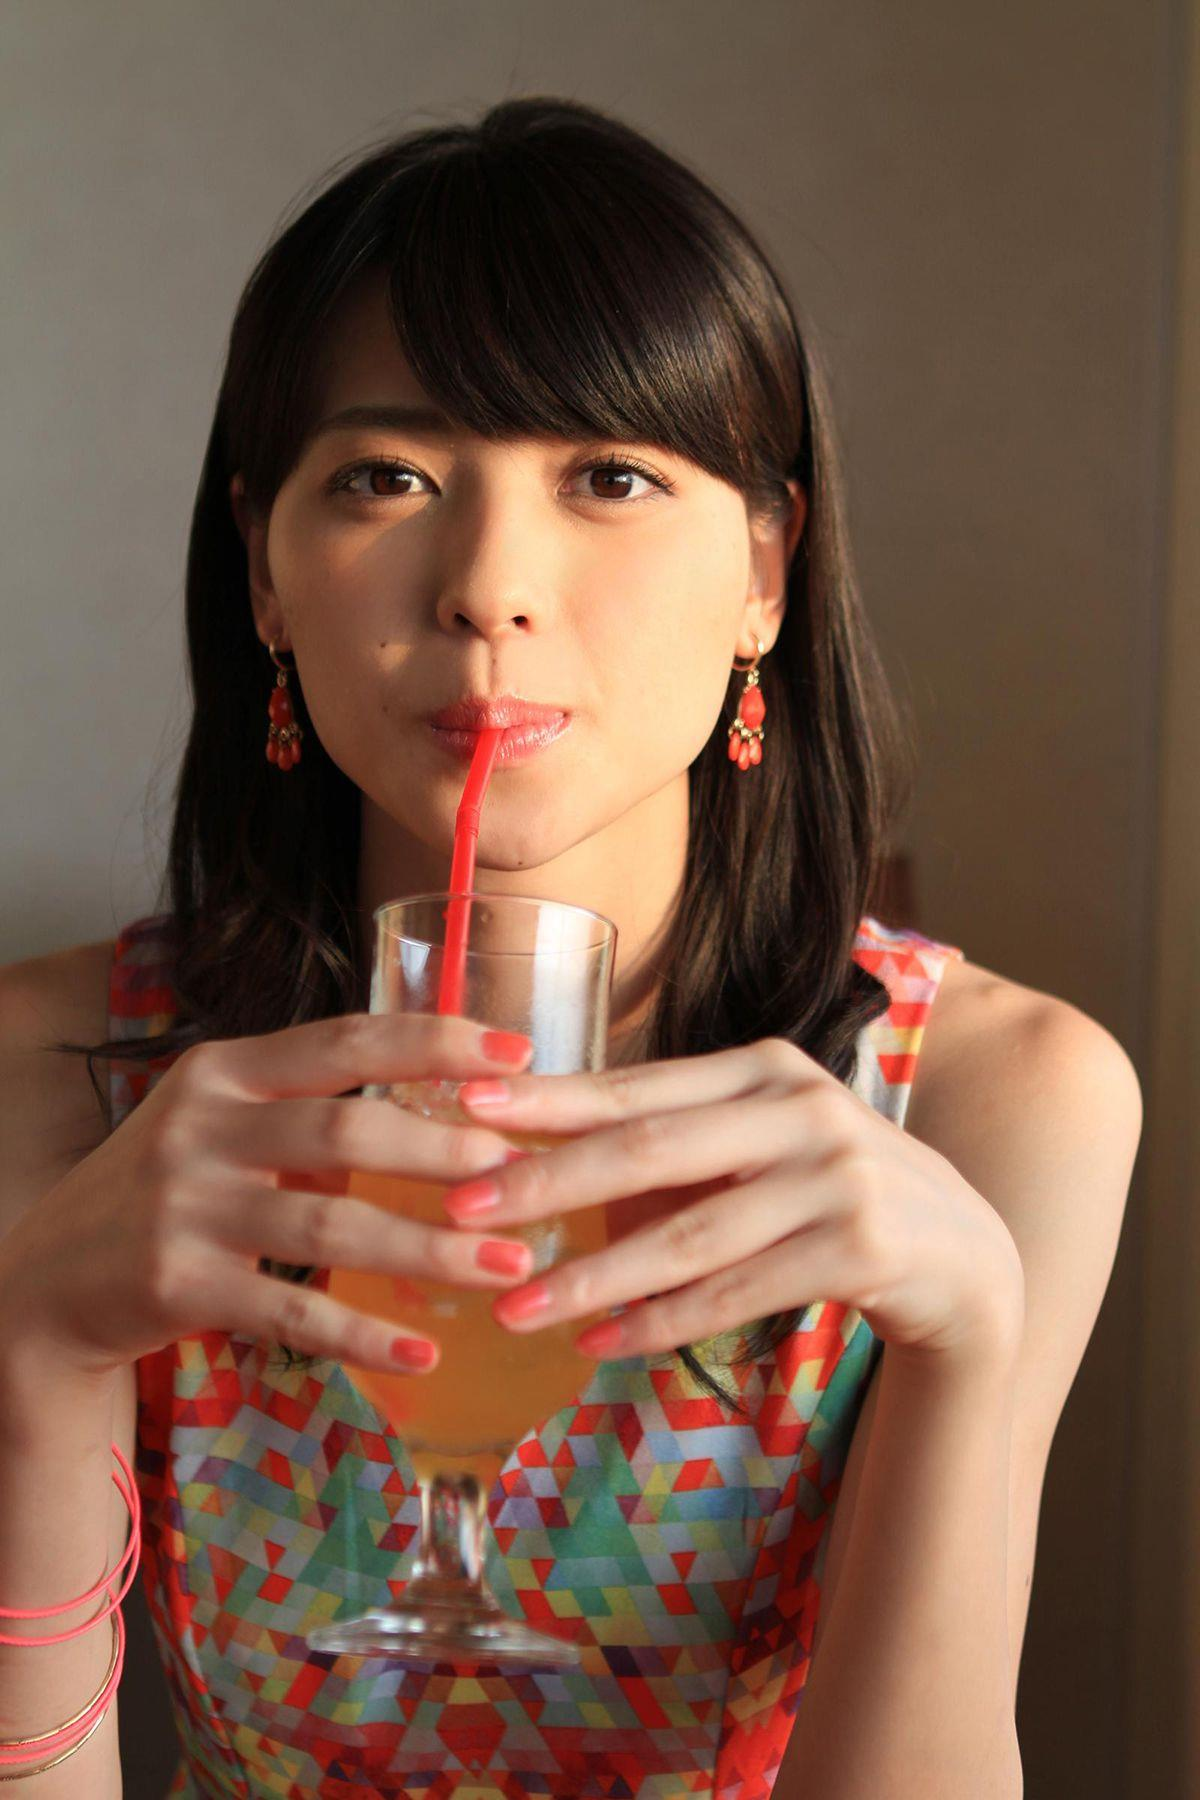 矢島舞美 エロ画像 61